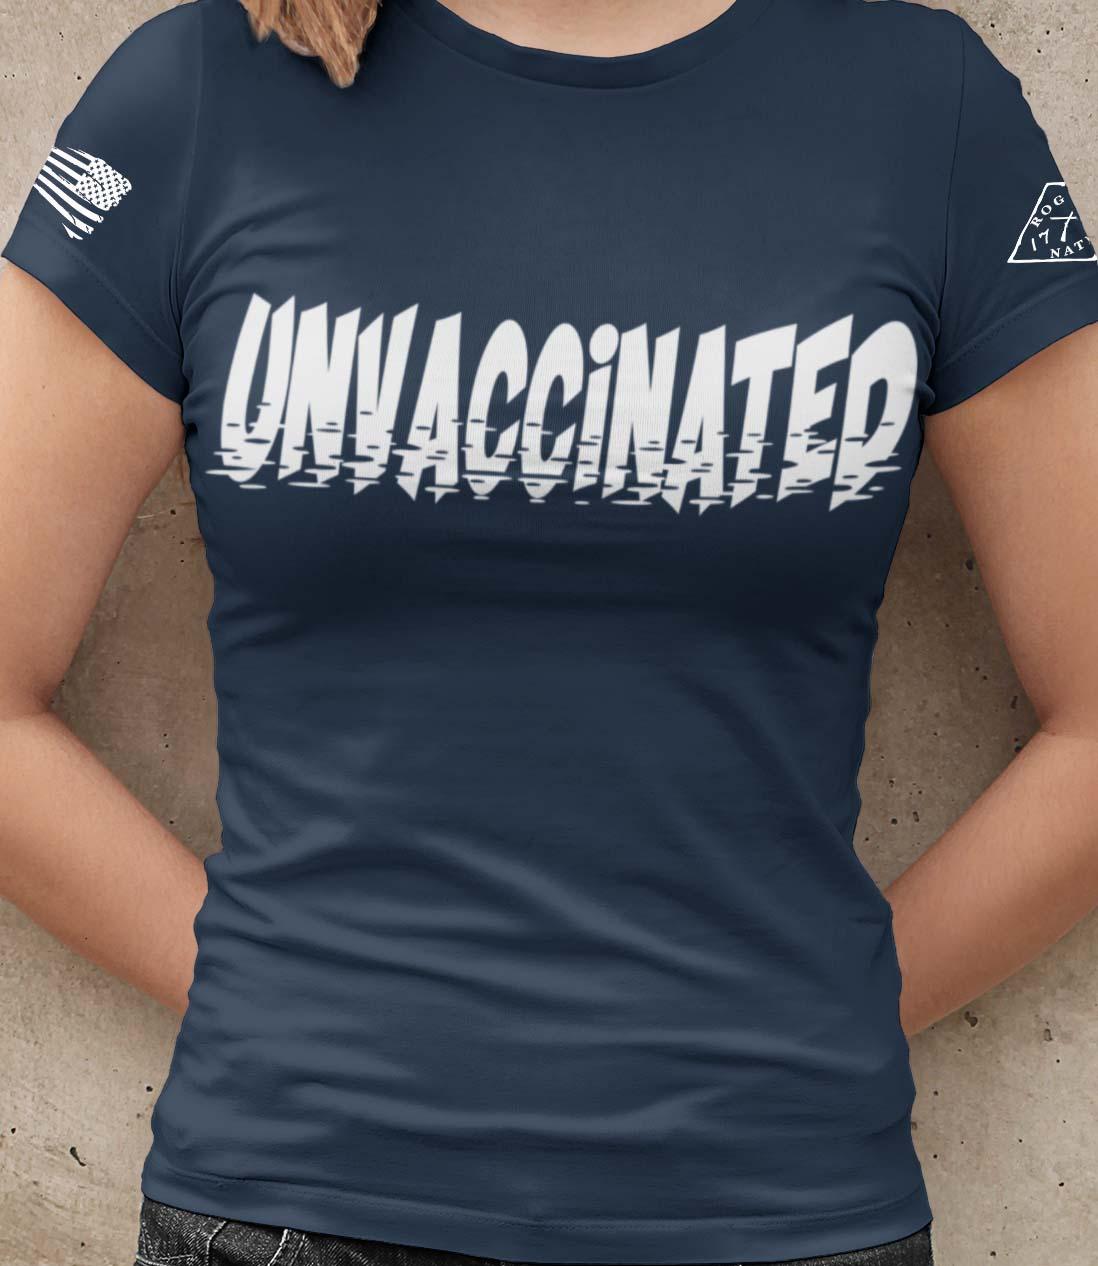 Unvaccinated T-Shirt Women's